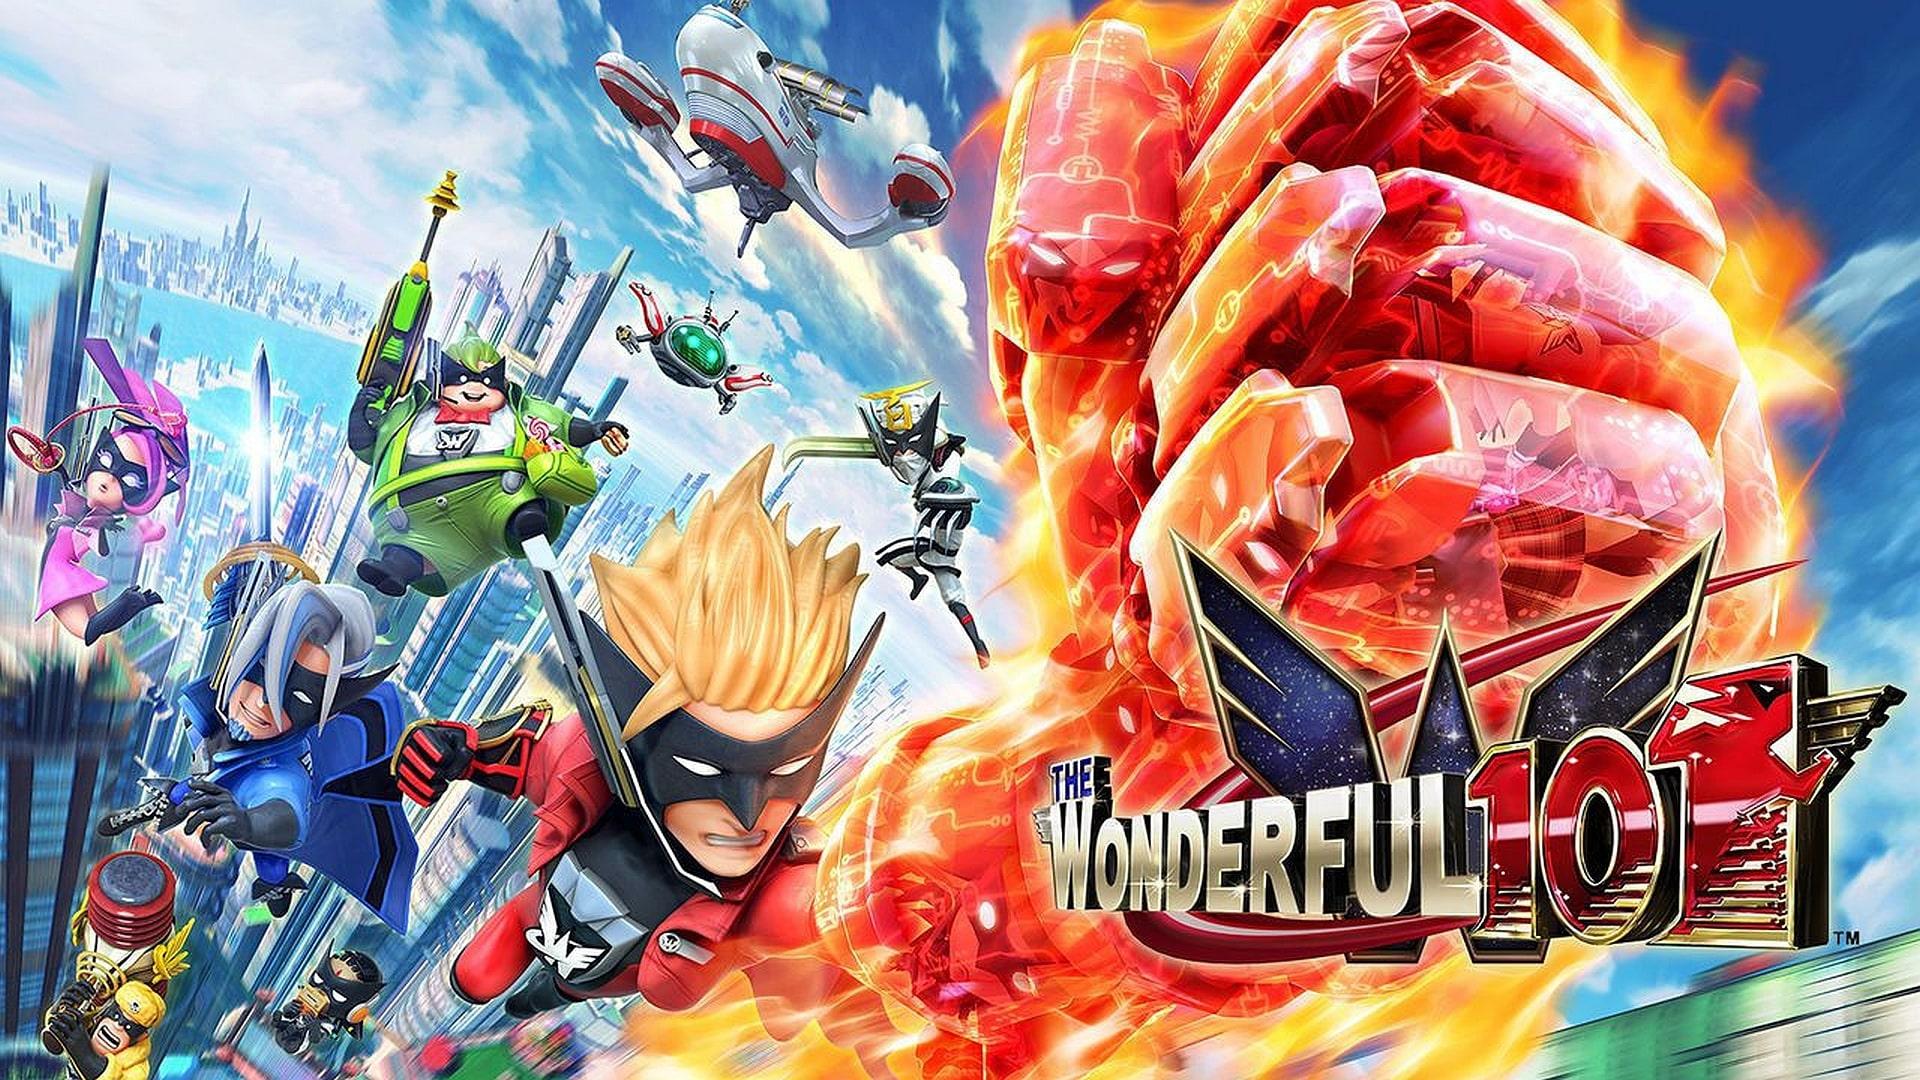 The Wonderful 101: Remastered Kickstarter PlatinumGames Platinum Games